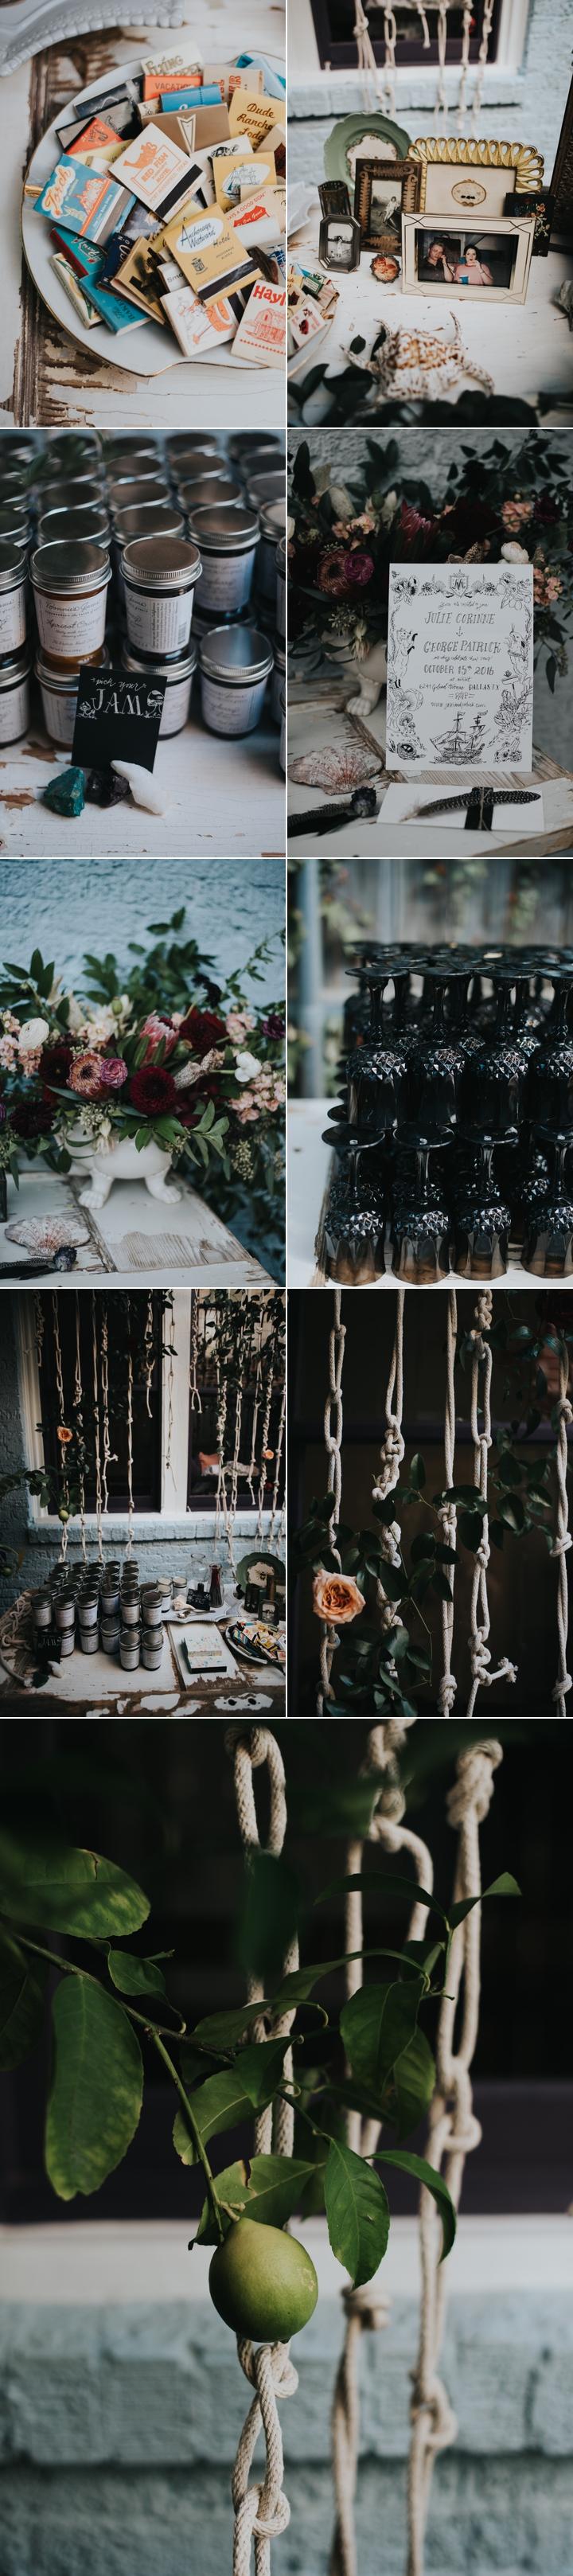 dallas-wedding-photographers-jp 16.jpg